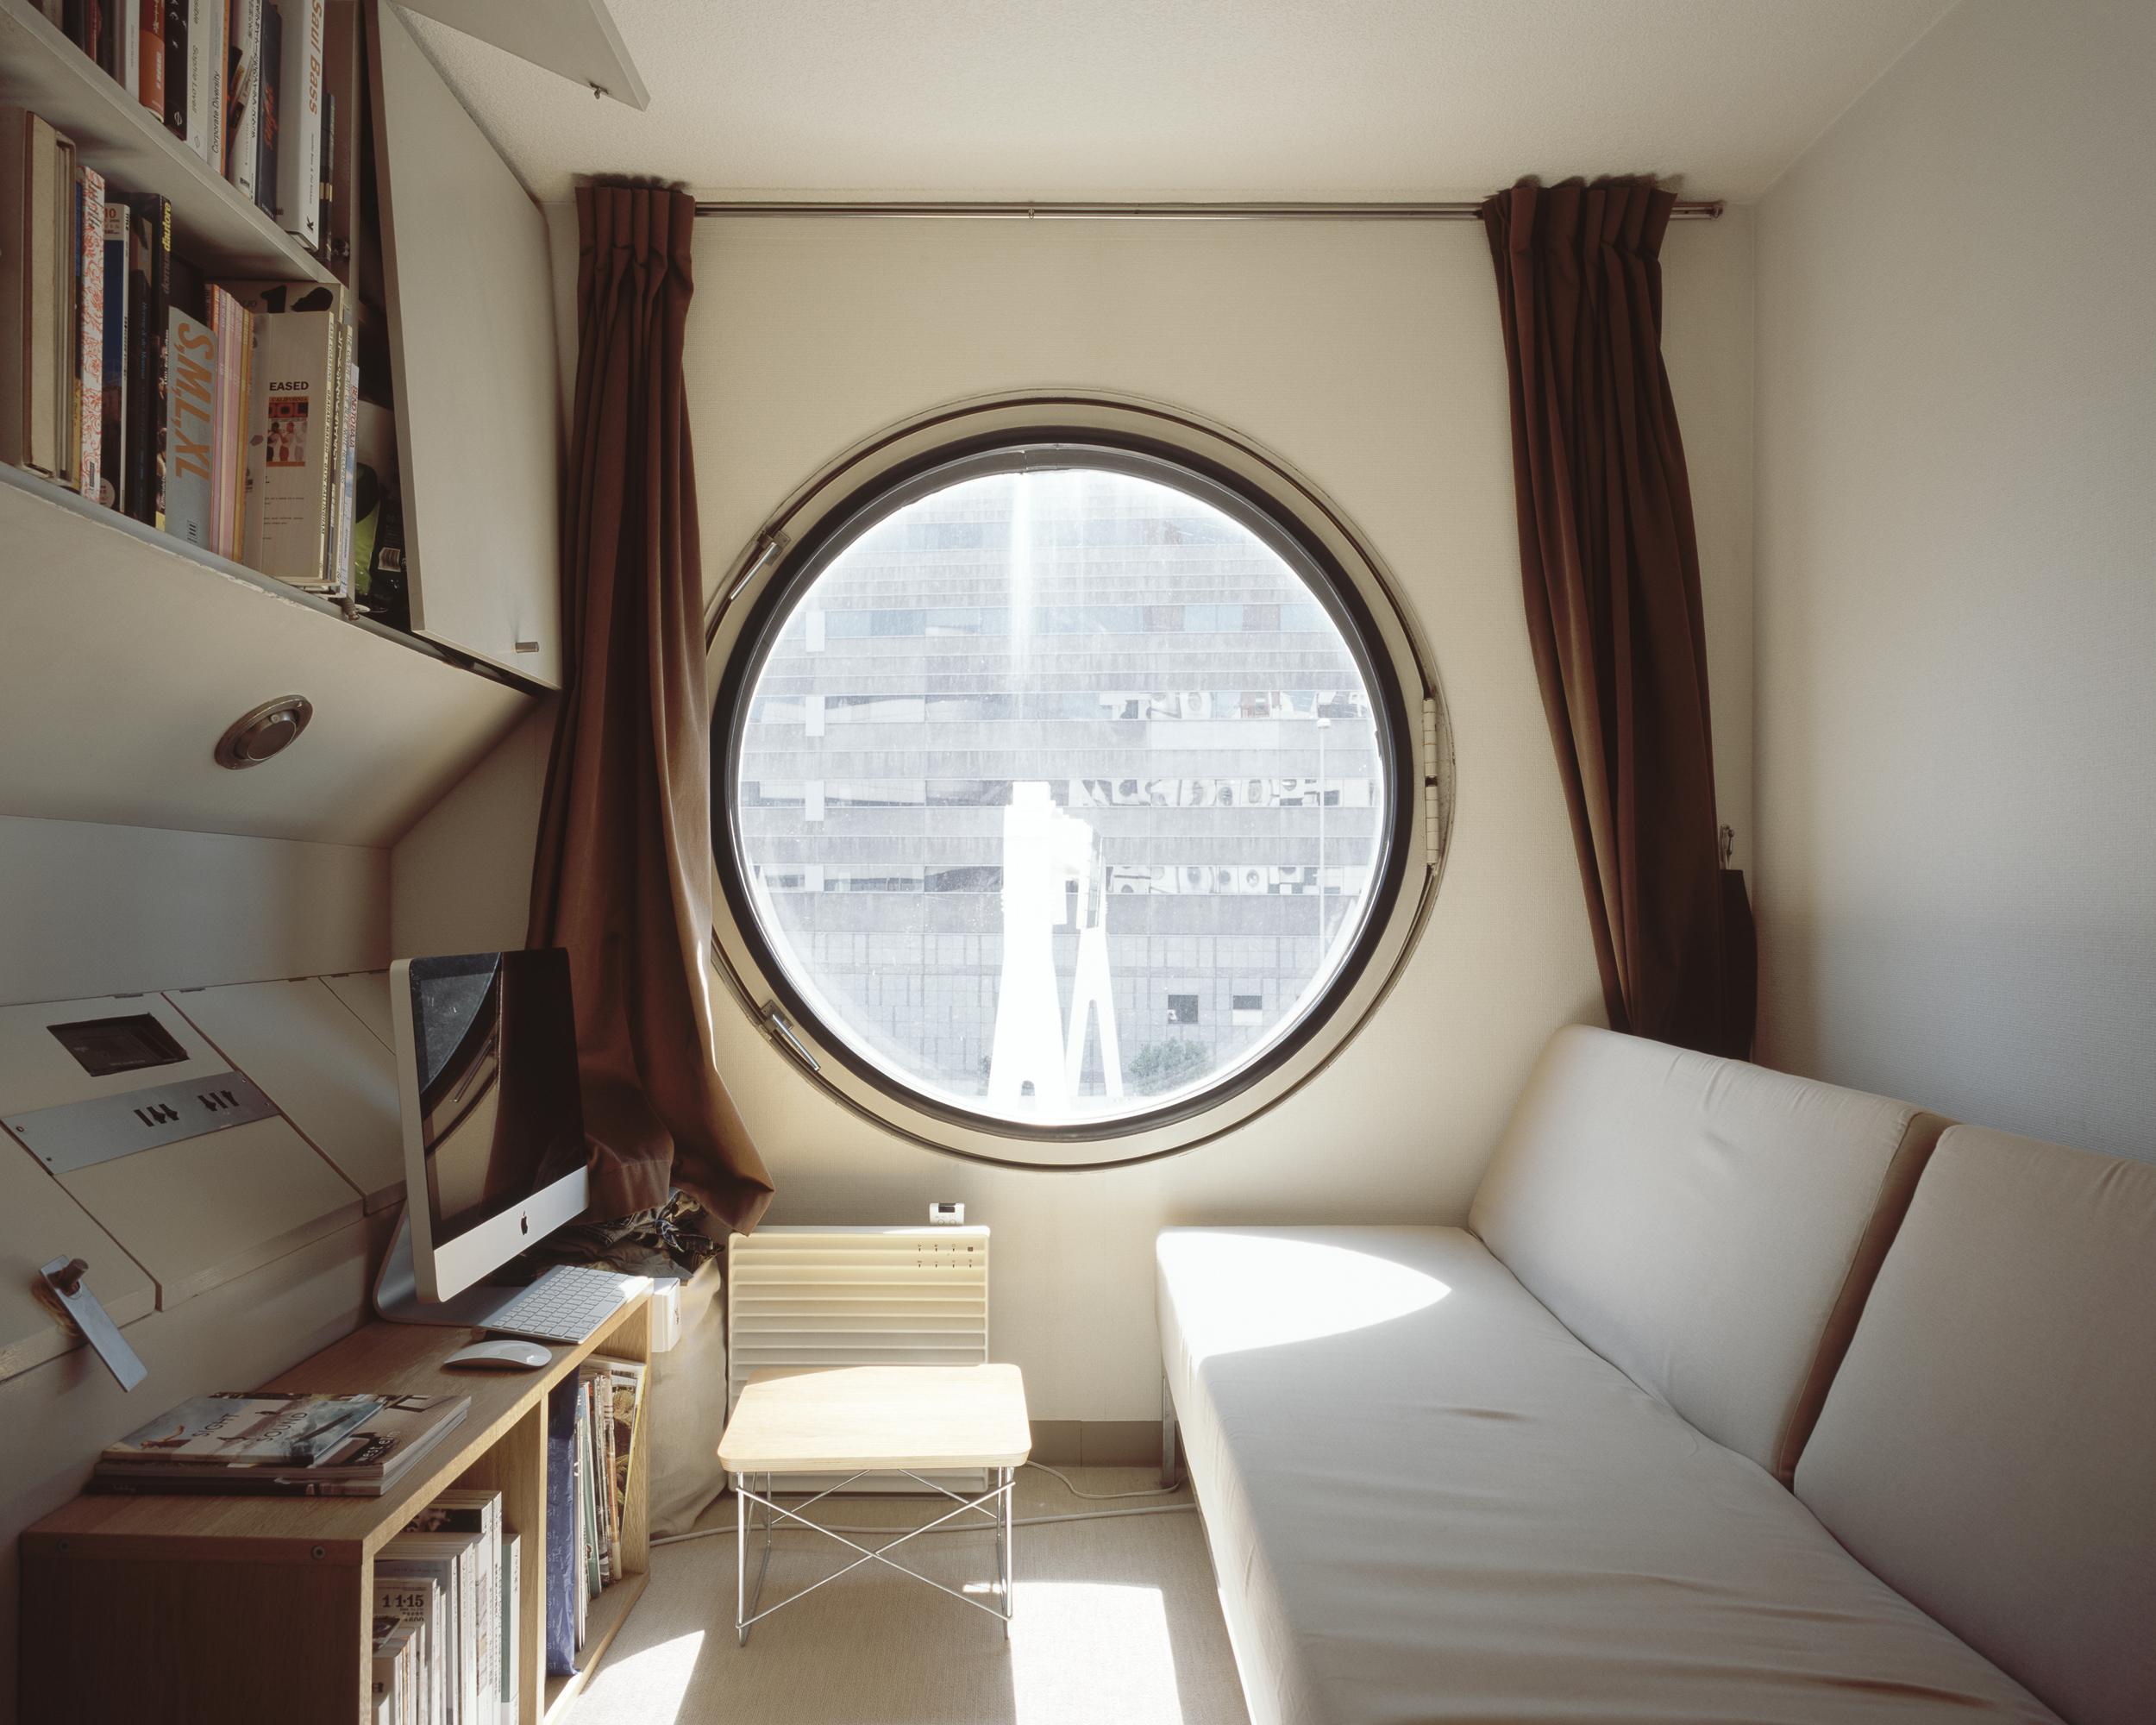 Noritaka Minami, A504 I (Nakagin Capsule Tower, Tokyo, Japan), 2012